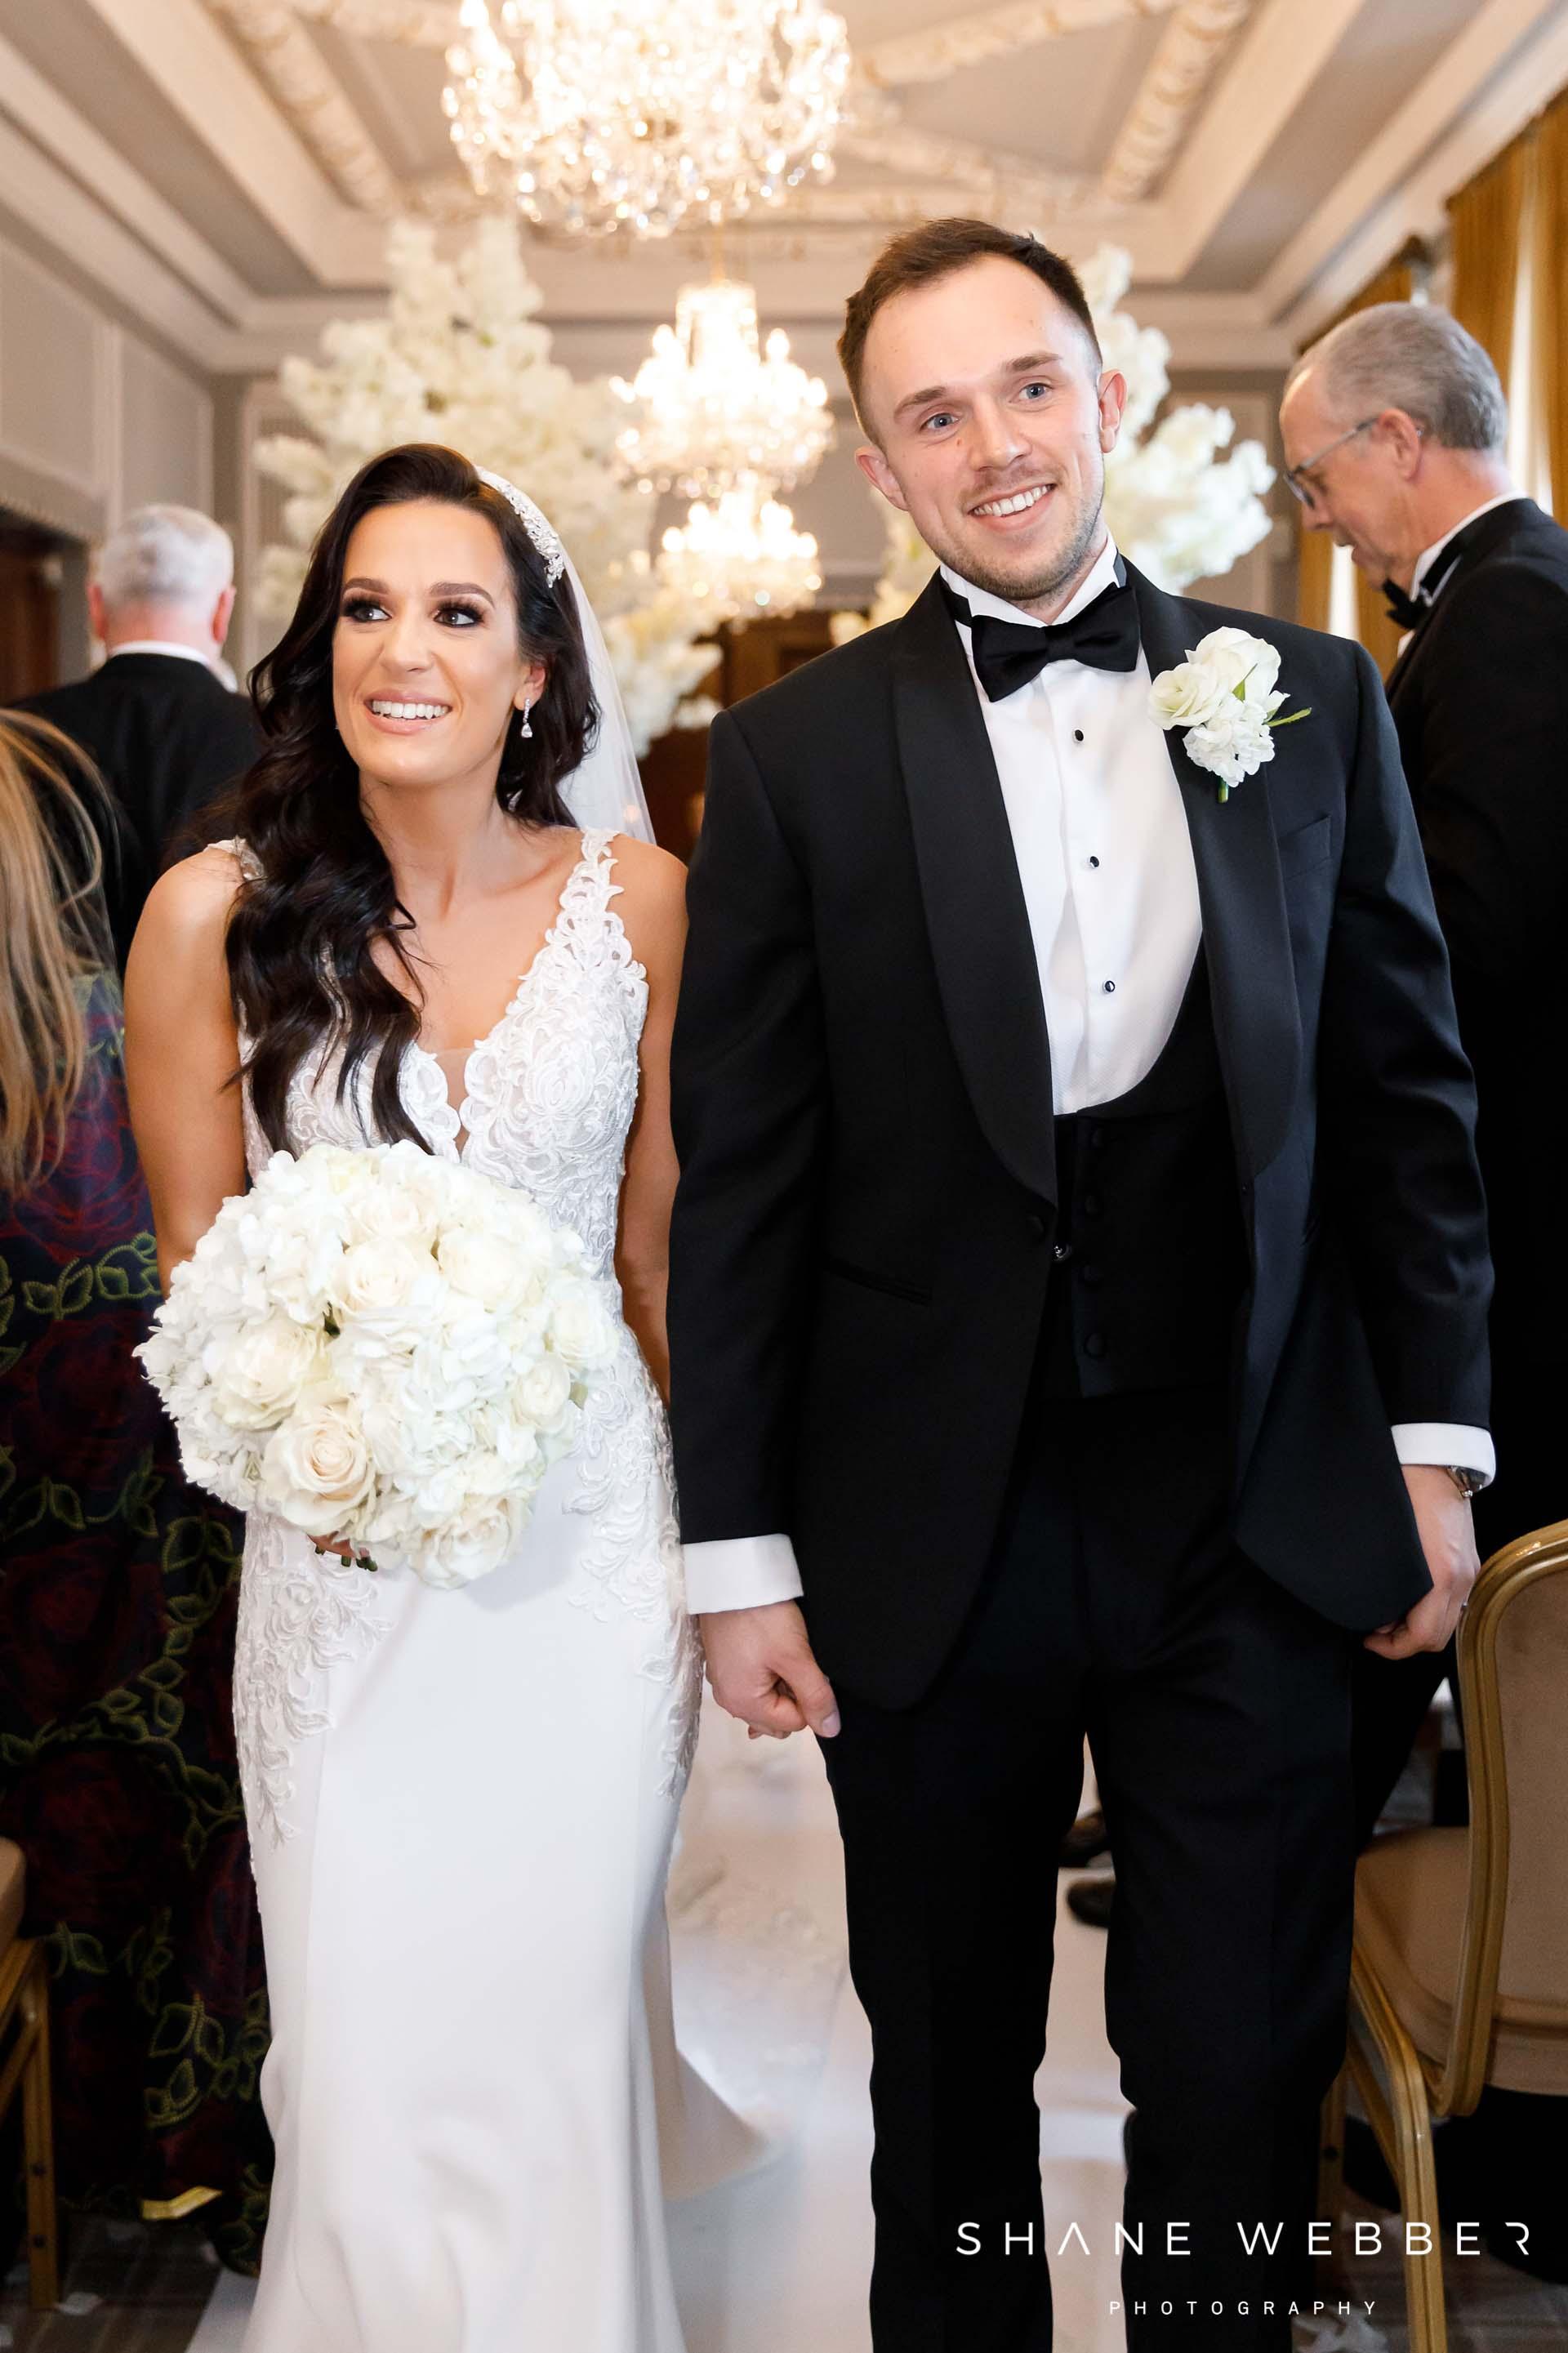 Manchester Hall wedding ceremony